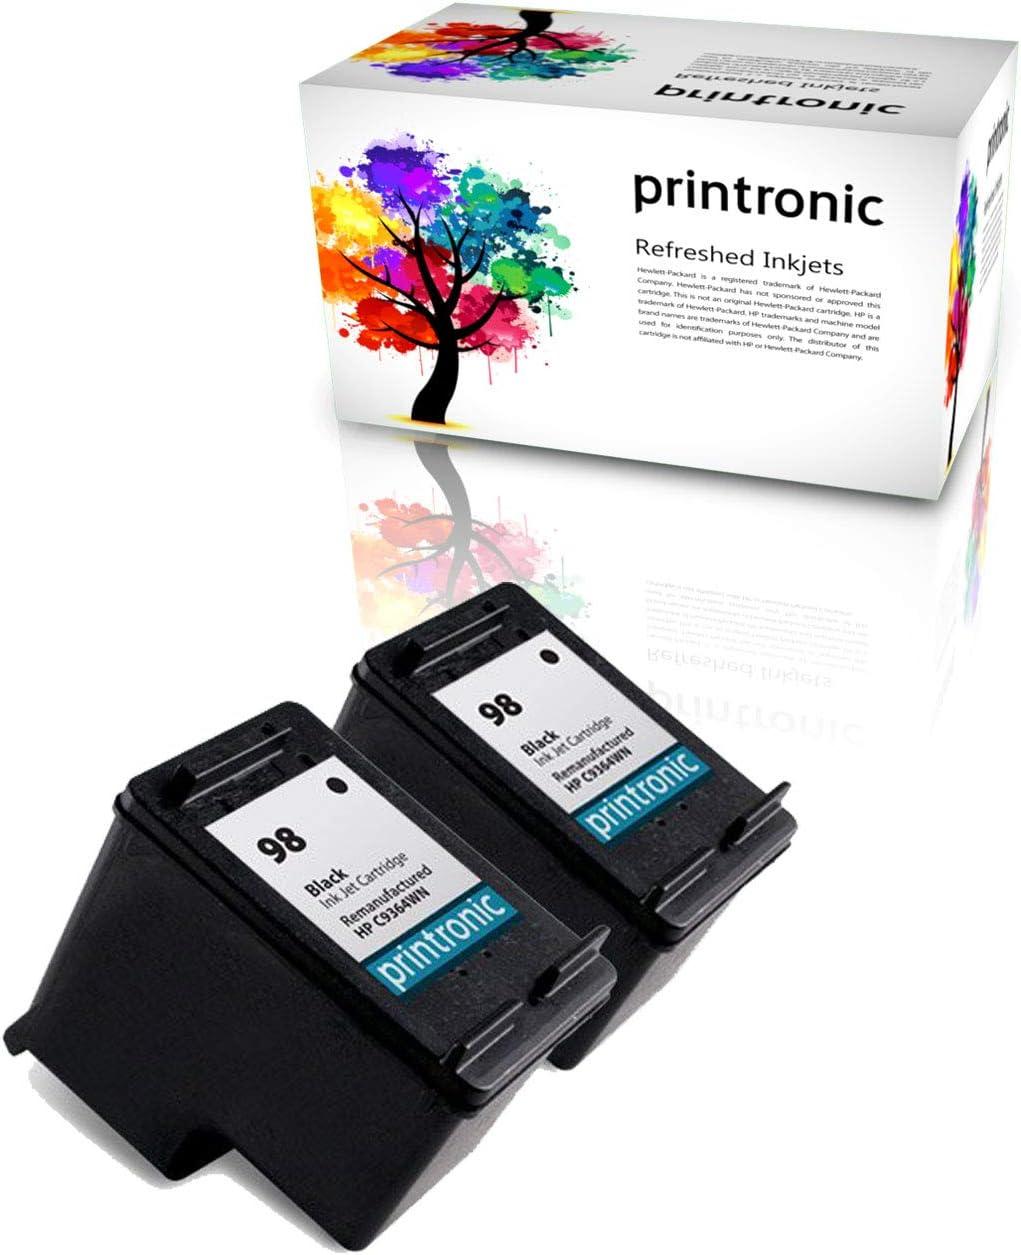 Printronic Remanufactured Ink Cartridge Replacement for HP 98 for DeskJet D4145 OfficeJet H470 6310 PhotoSmart C4100 D5060 (2 Black)